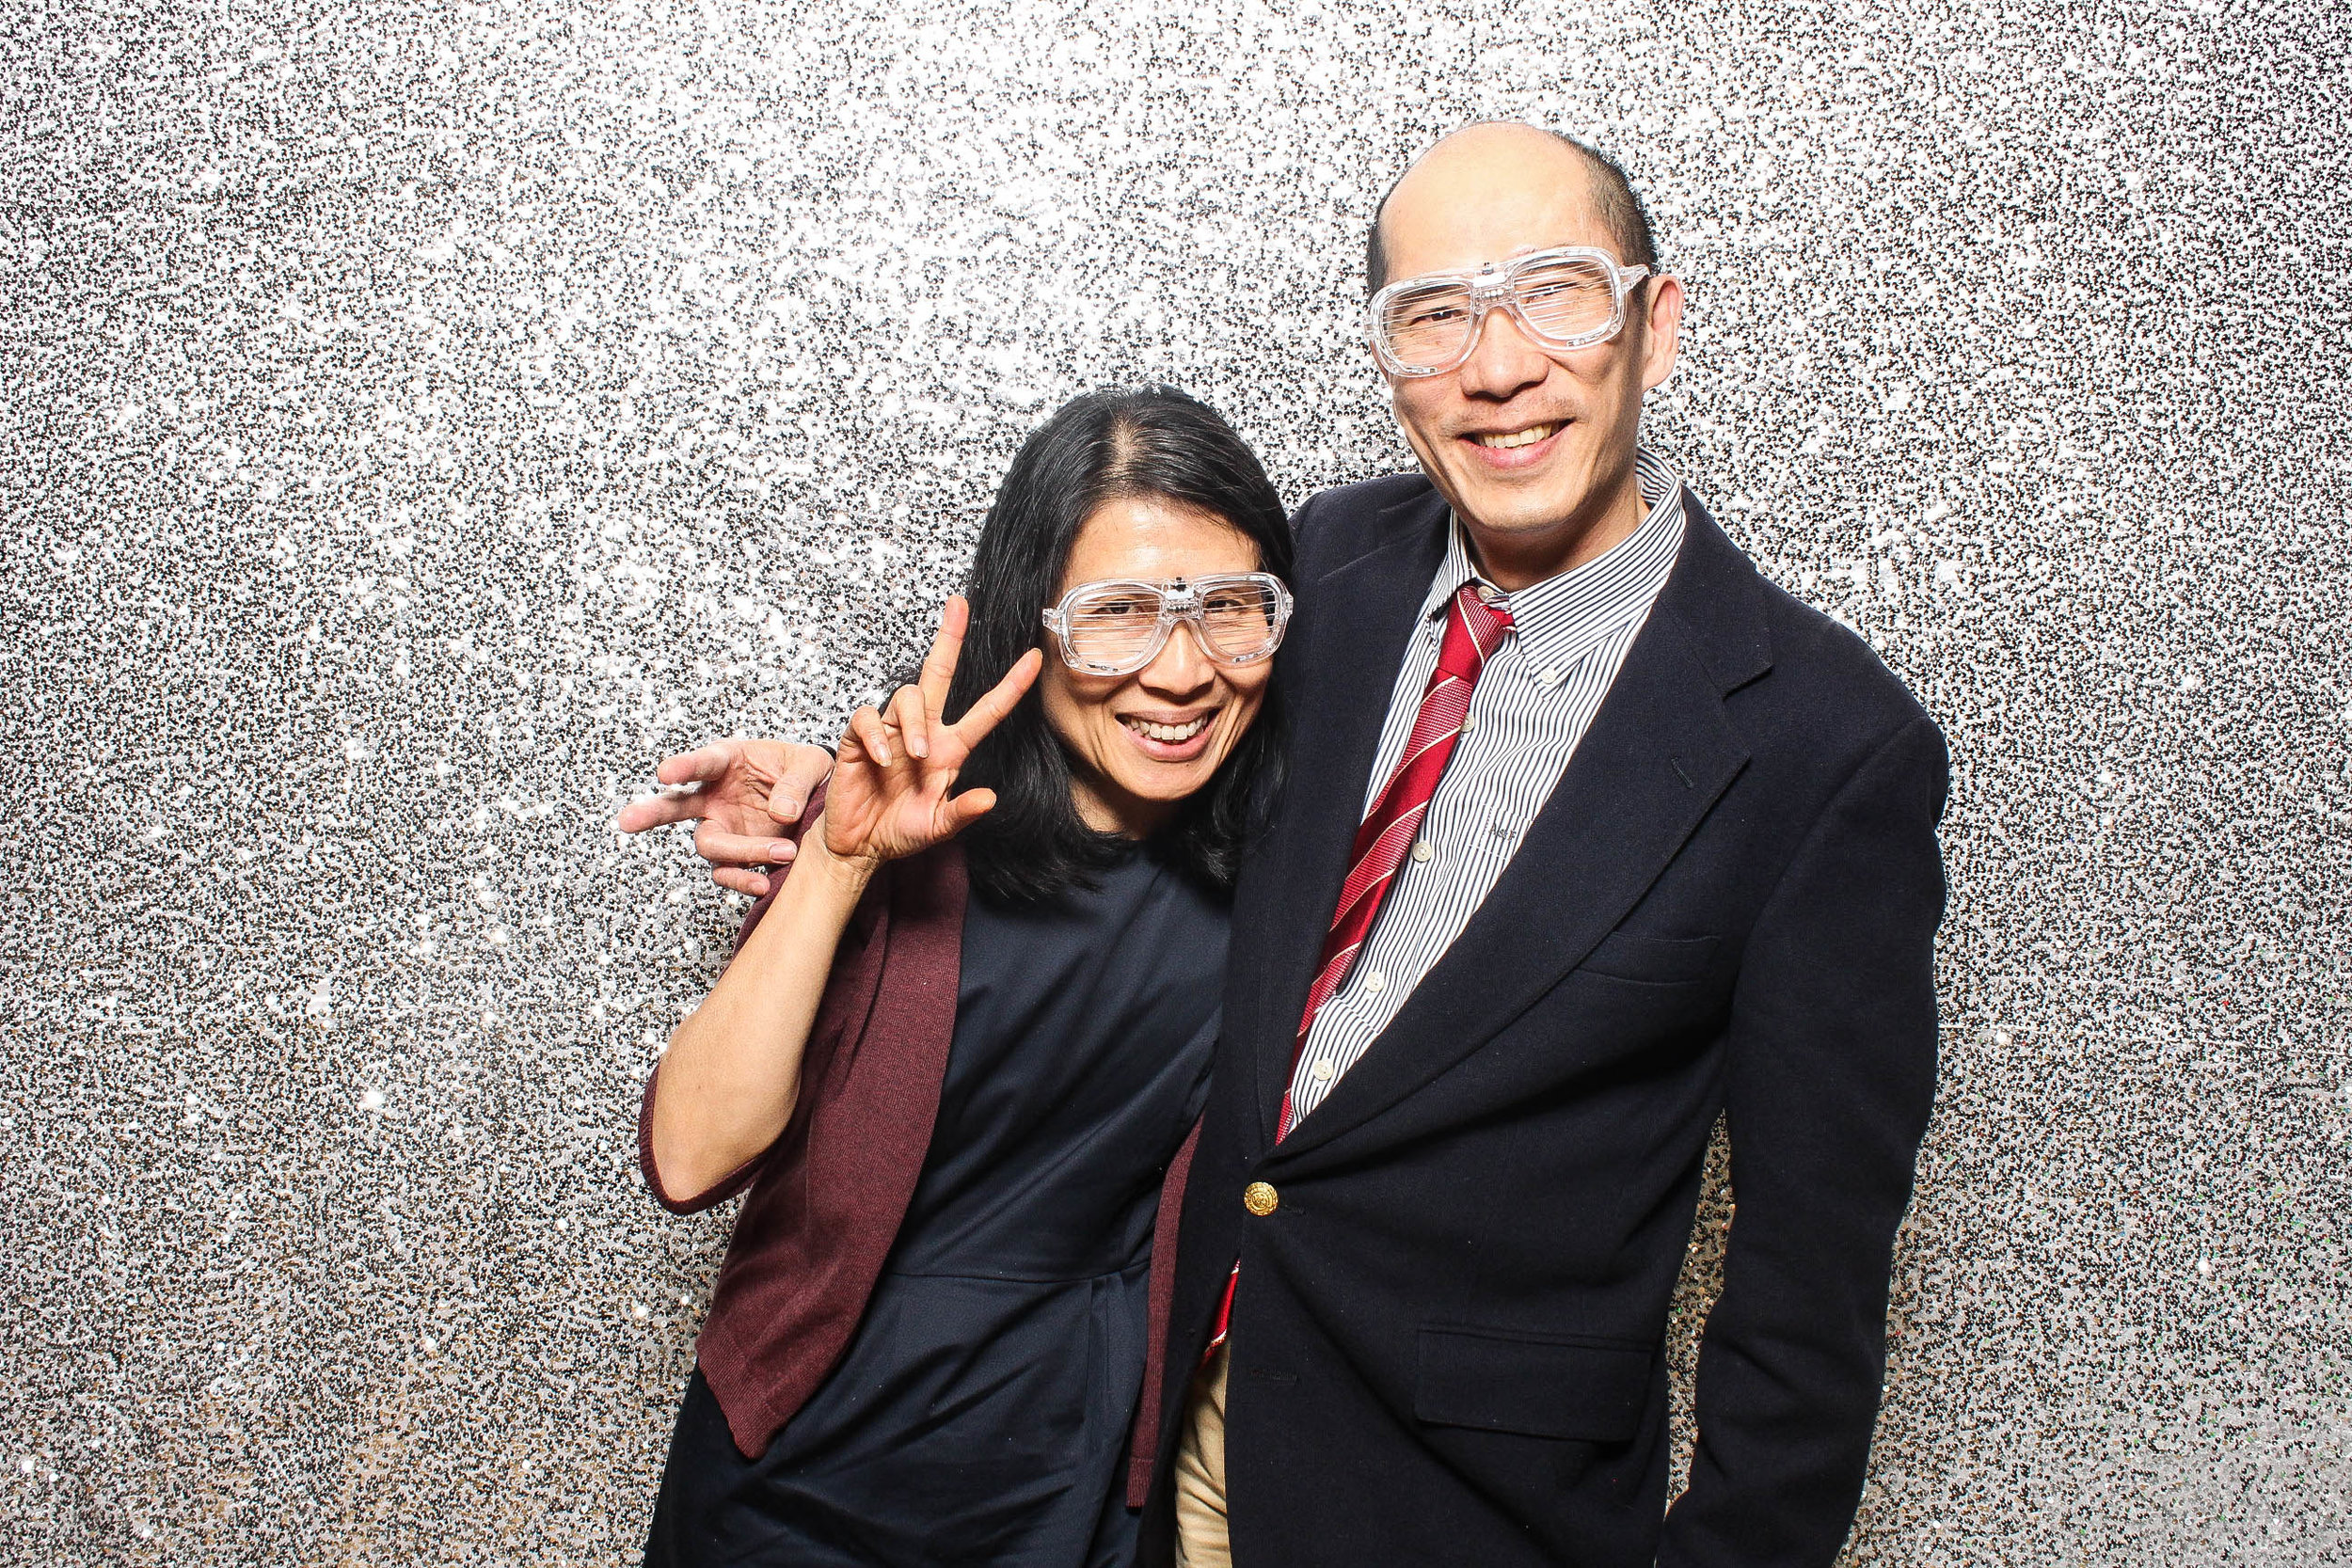 20181116_Matsuzaki-065.jpg